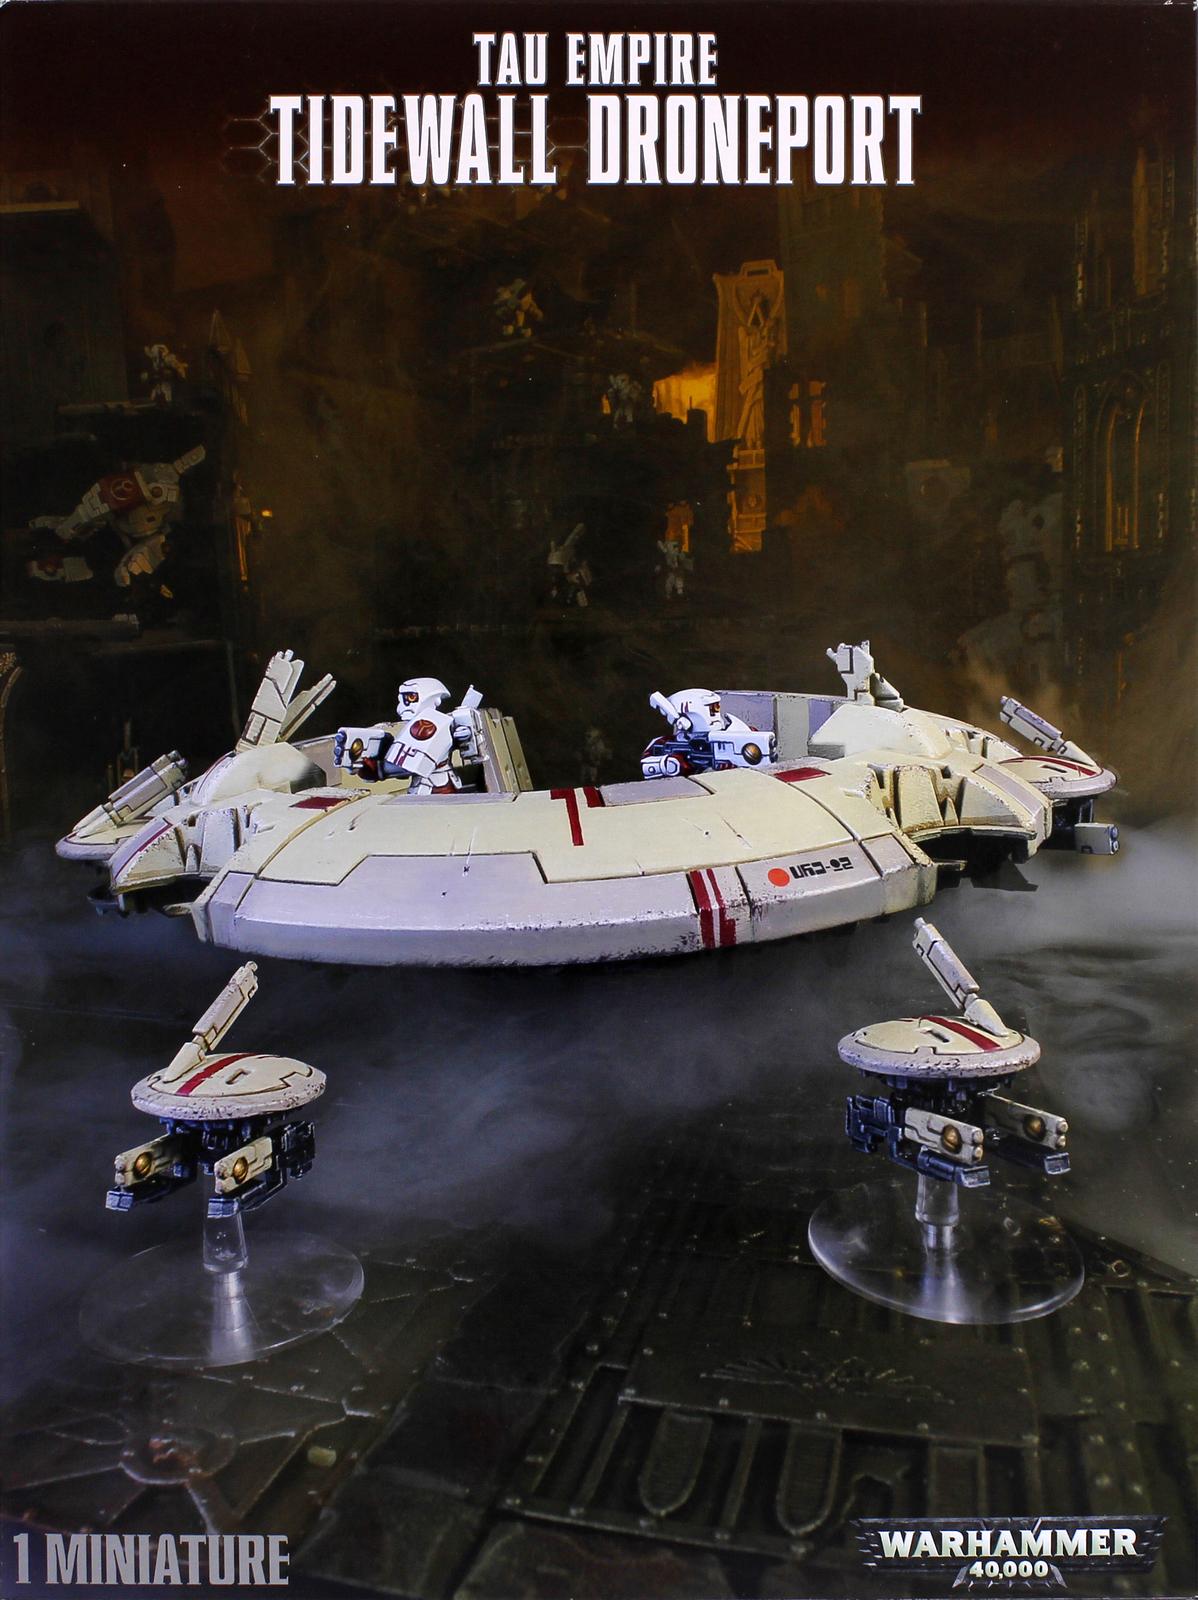 Warhammer 40,000 Tau Empire Tidewall Droneport image